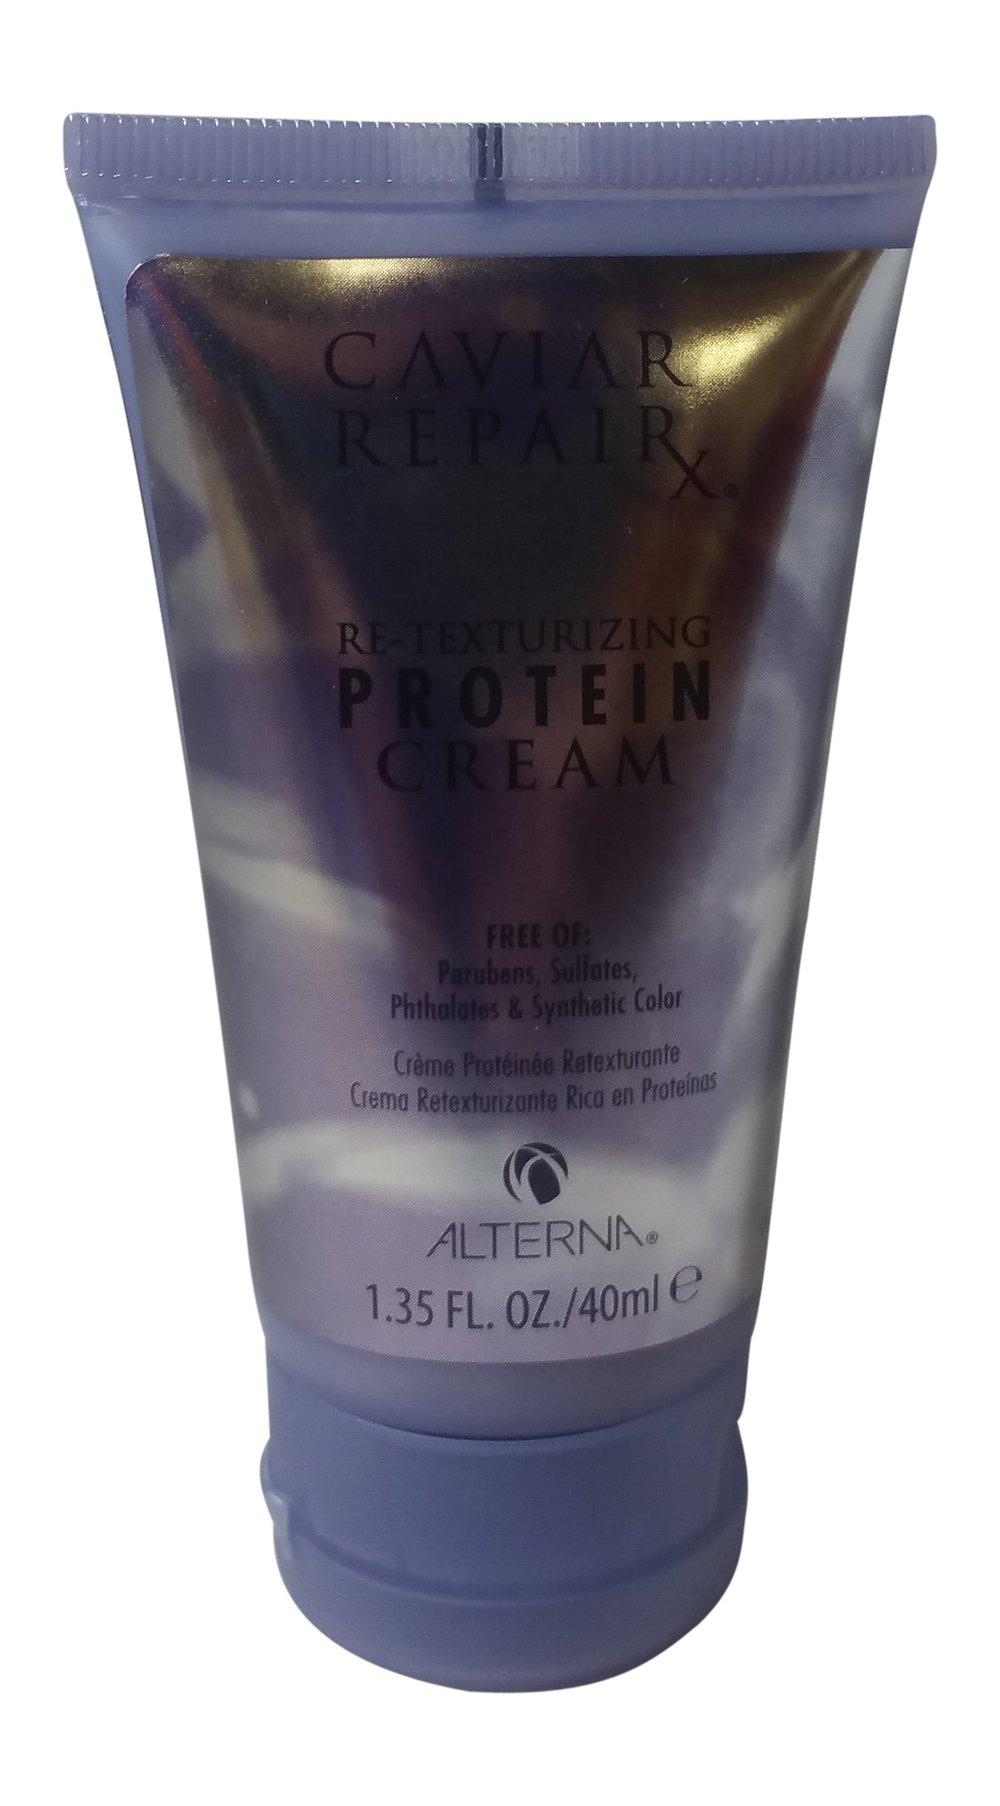 Alterna Caviar Repair Travel Trio: Instant Recovery Shampoo & Conditioner & Re-Texturizing Protein Cream 1.35 oz each by Alterna (Image #2)